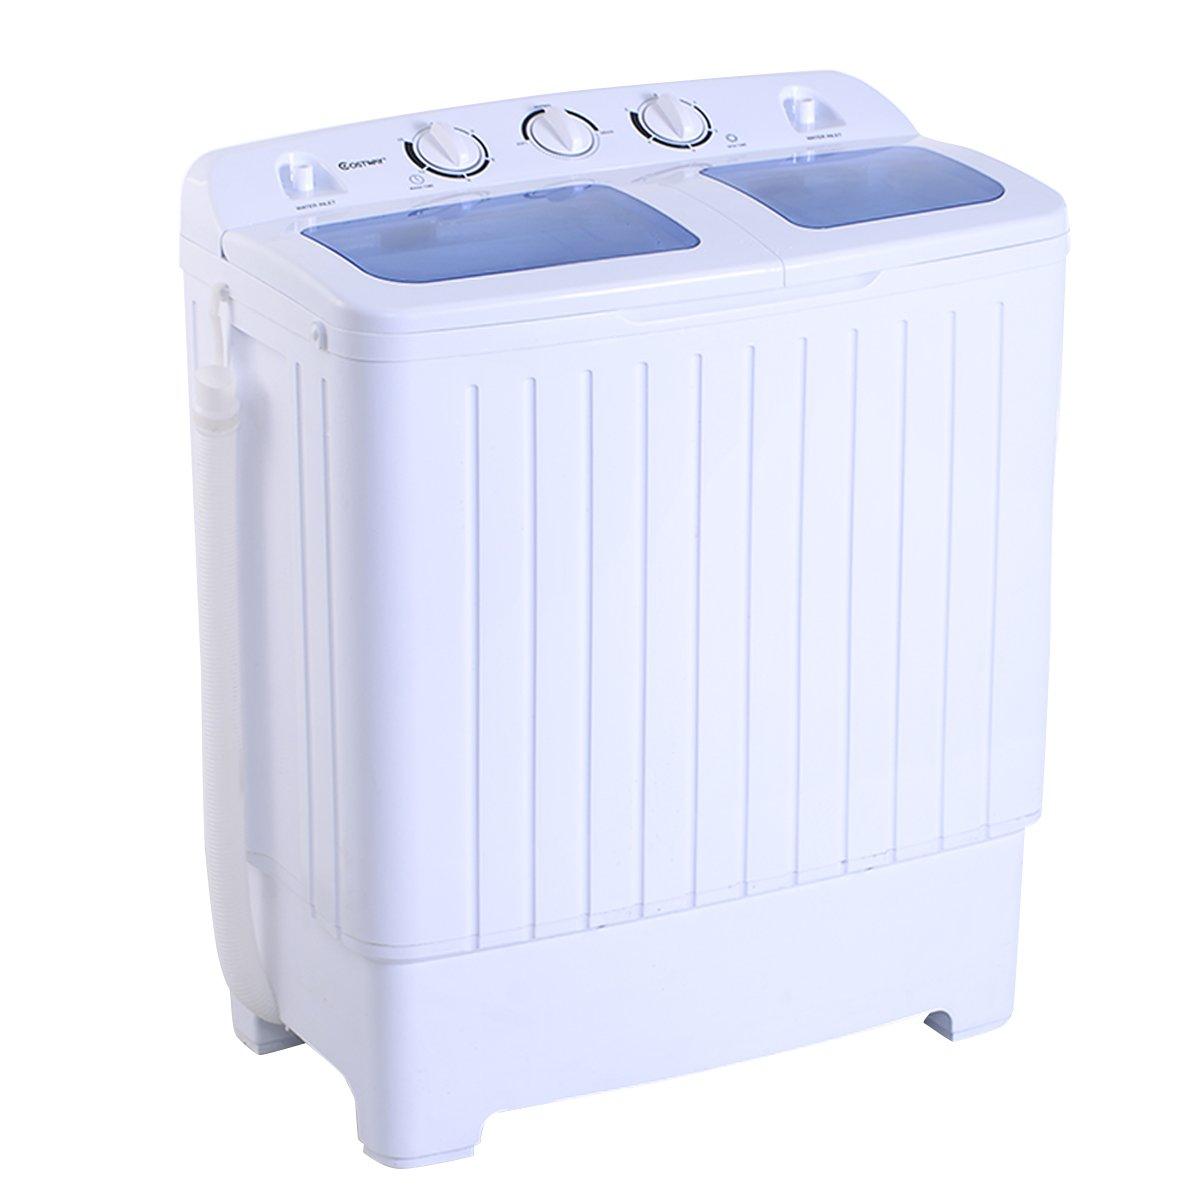 MINI machine à laver Lave-linge + Essoreuse 2 Buckets 4, 5 kg 300 W Blitzzauber24